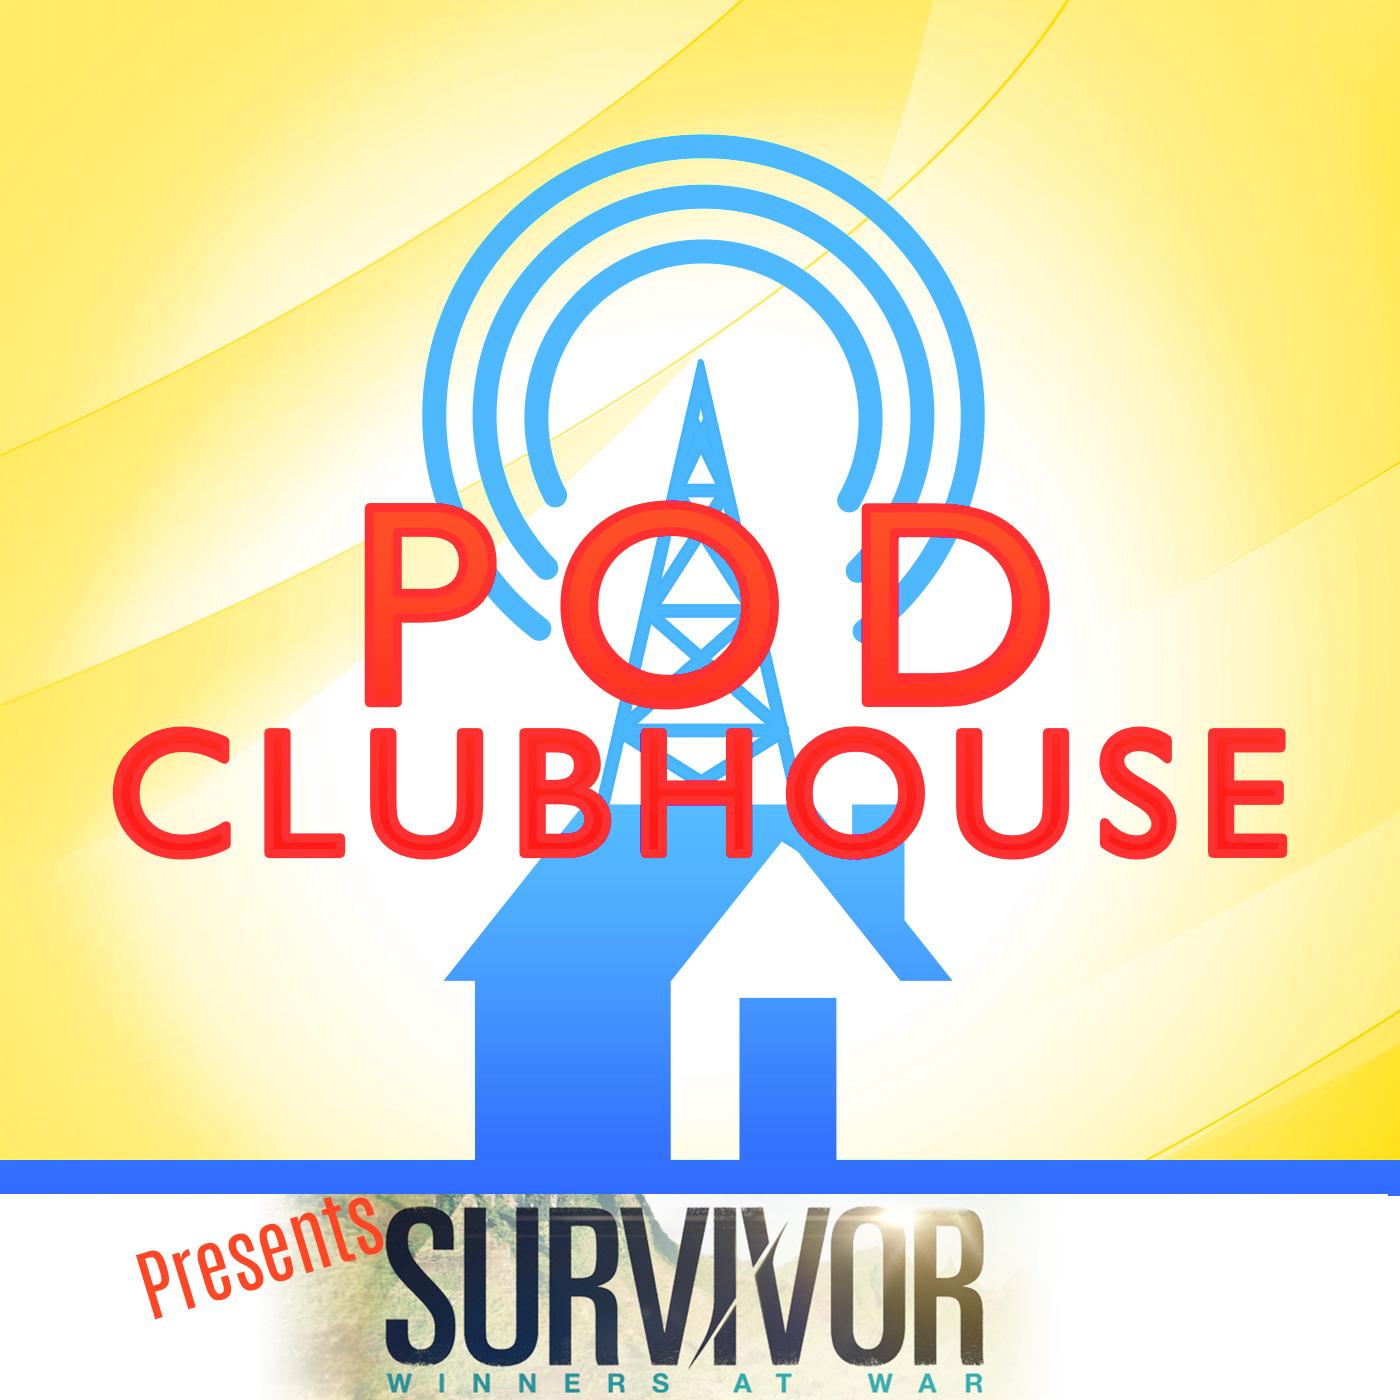 Pod Clubhouse Presents: Survivor